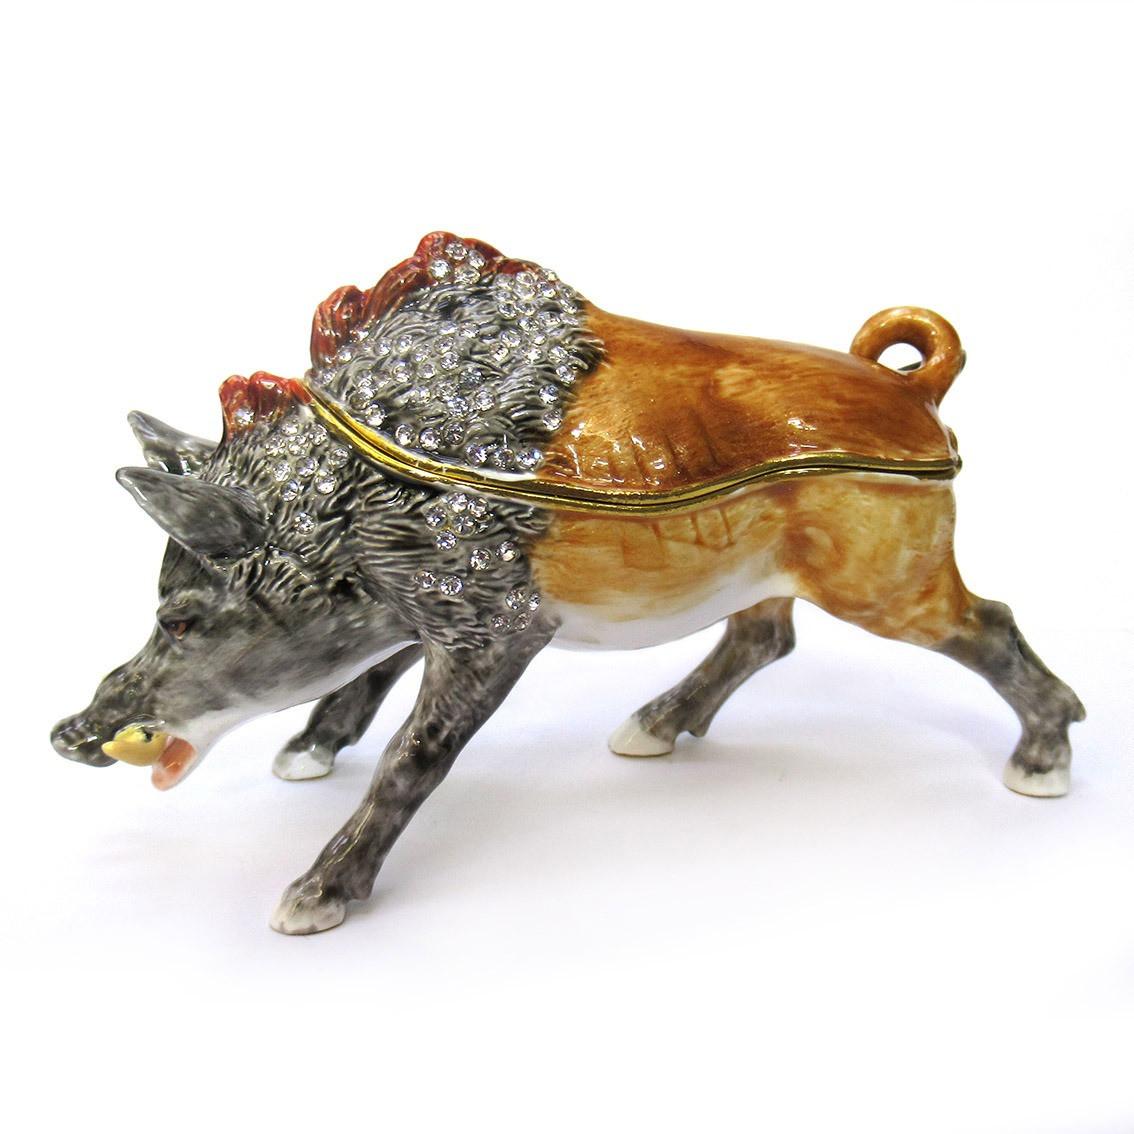 Скринька з металу на магніті інтер'єрна Дикий Кабан